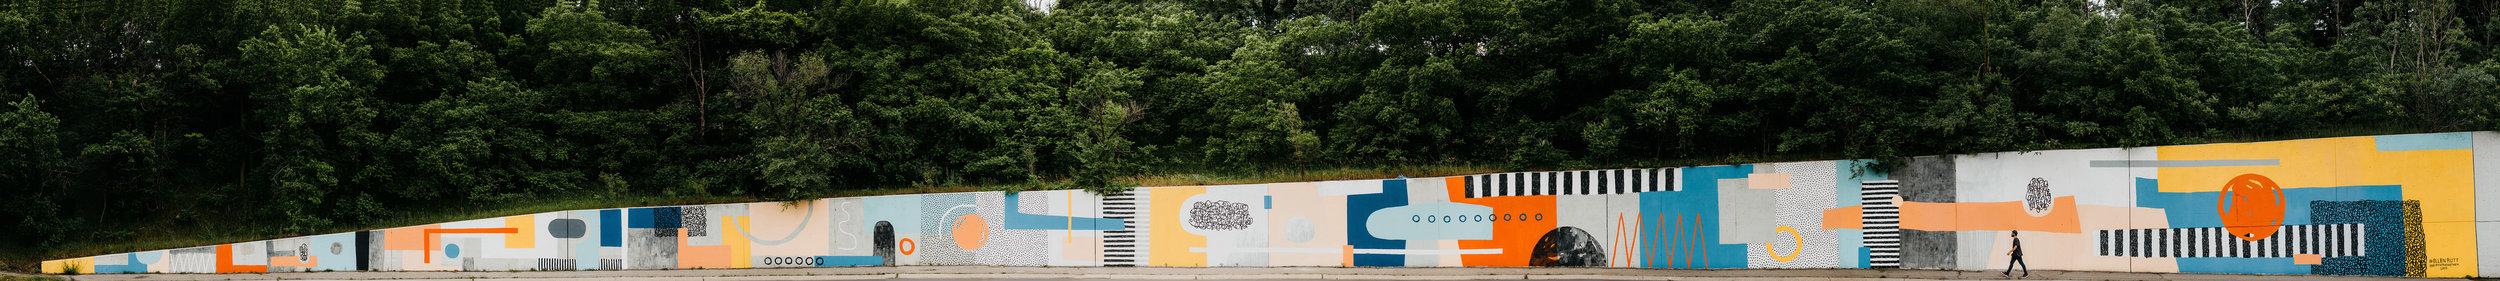 UICA Mural Full_small.jpg